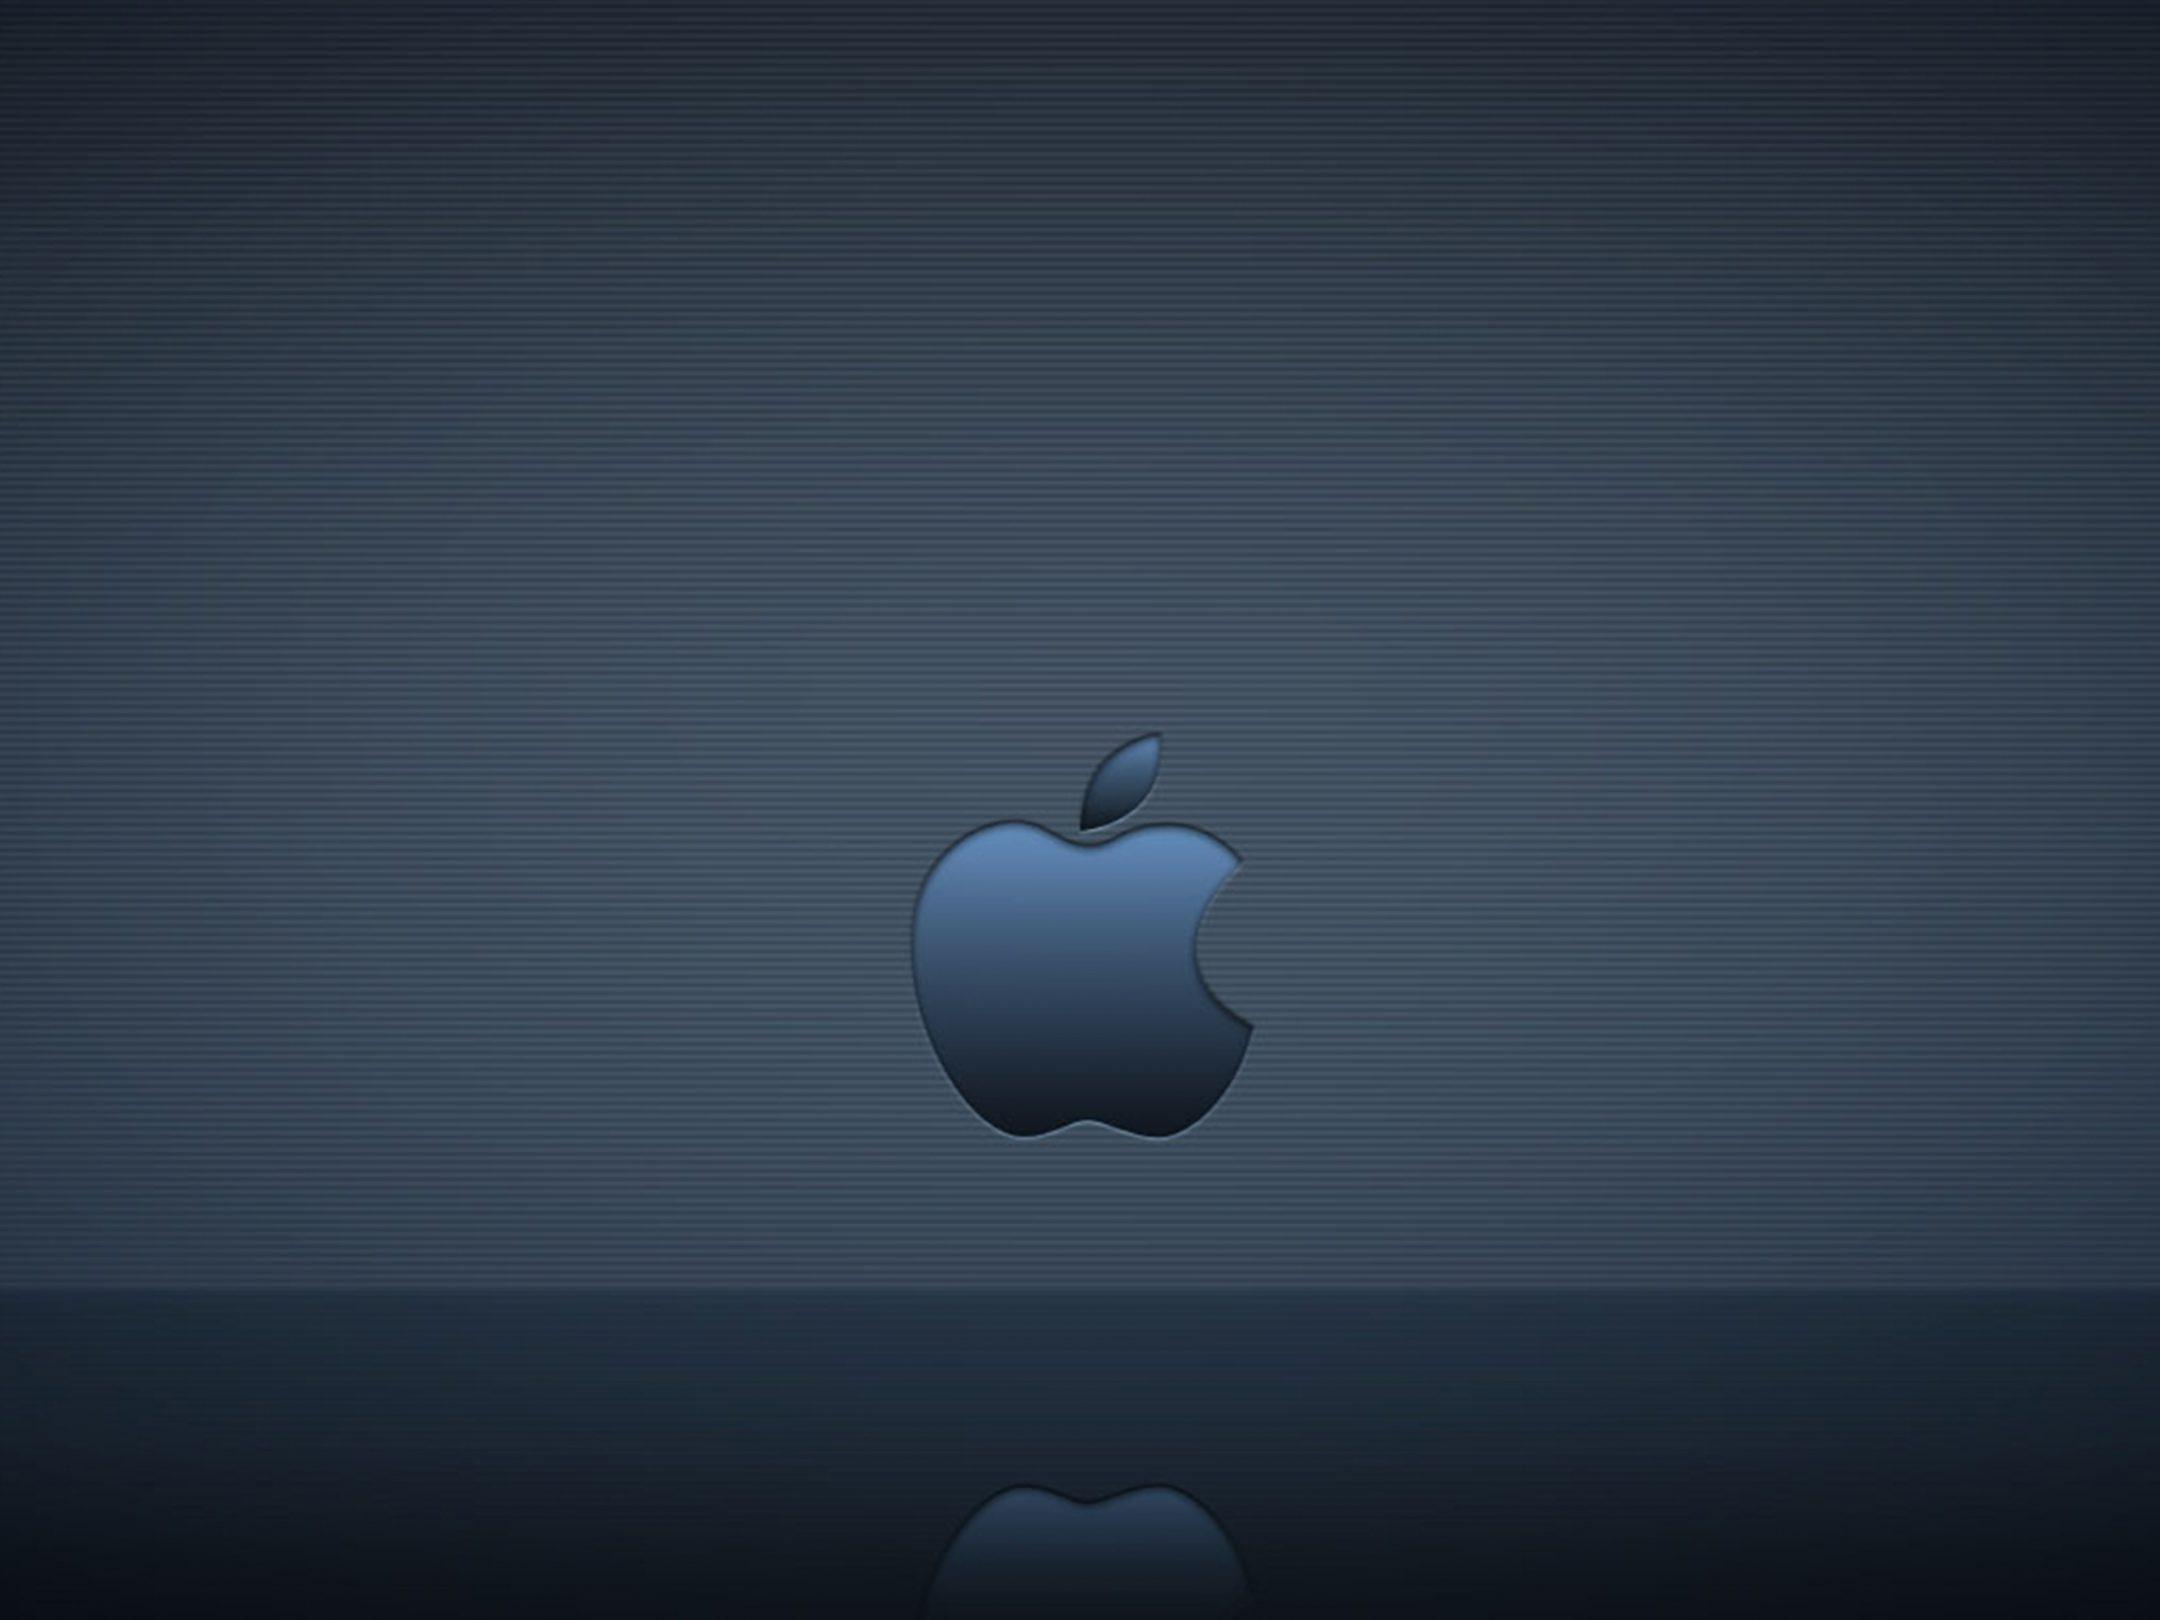 2160x1620 iPad wallpaper 4k Apple Logo Reflection Ipad Wallpaper 2160x1620 pixels resolution